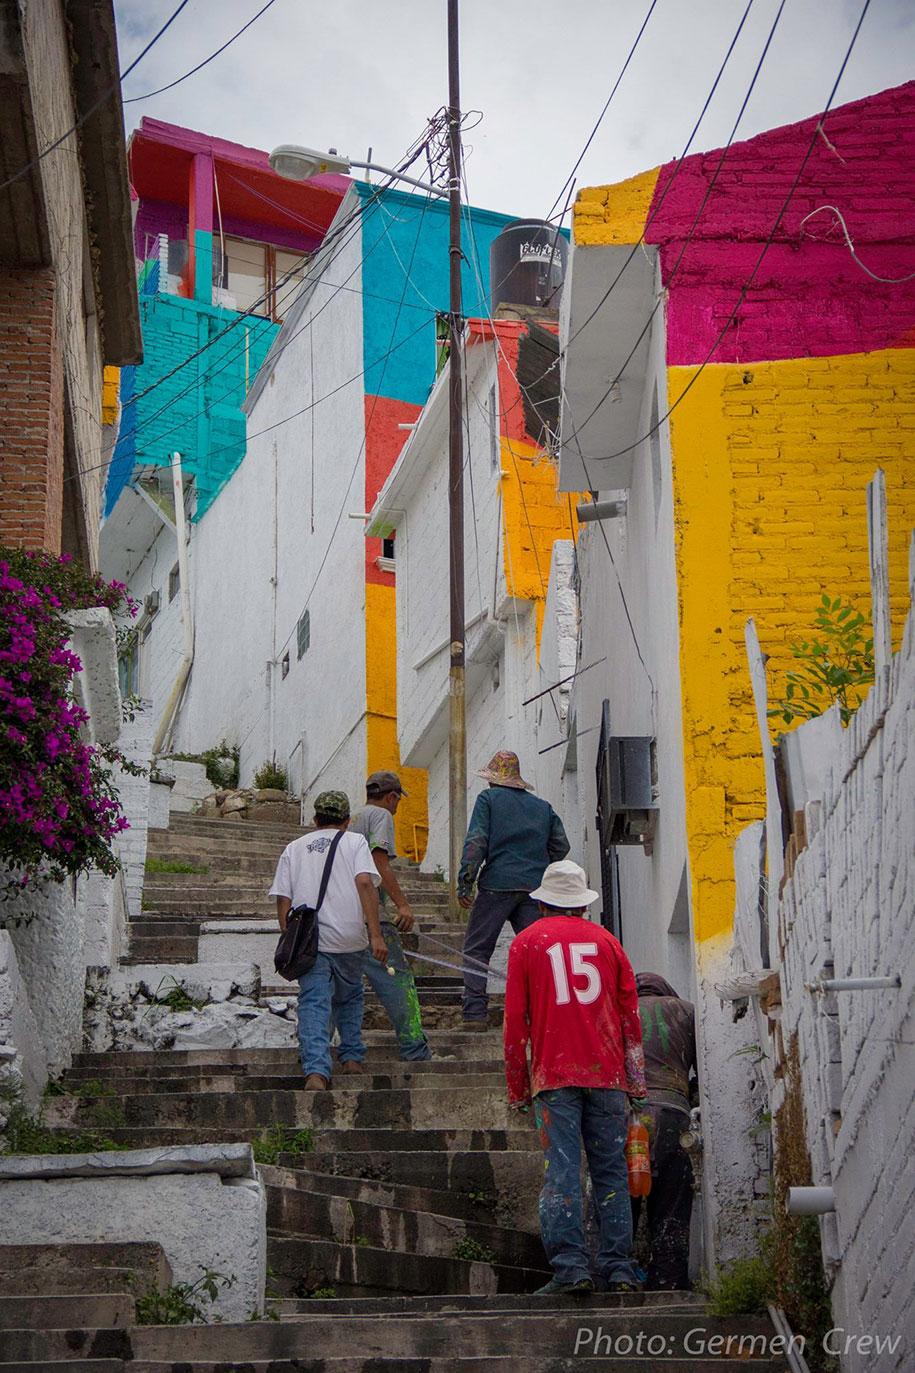 giant-street-art-palmitas-macro-mural-germen-crew-mexico-1